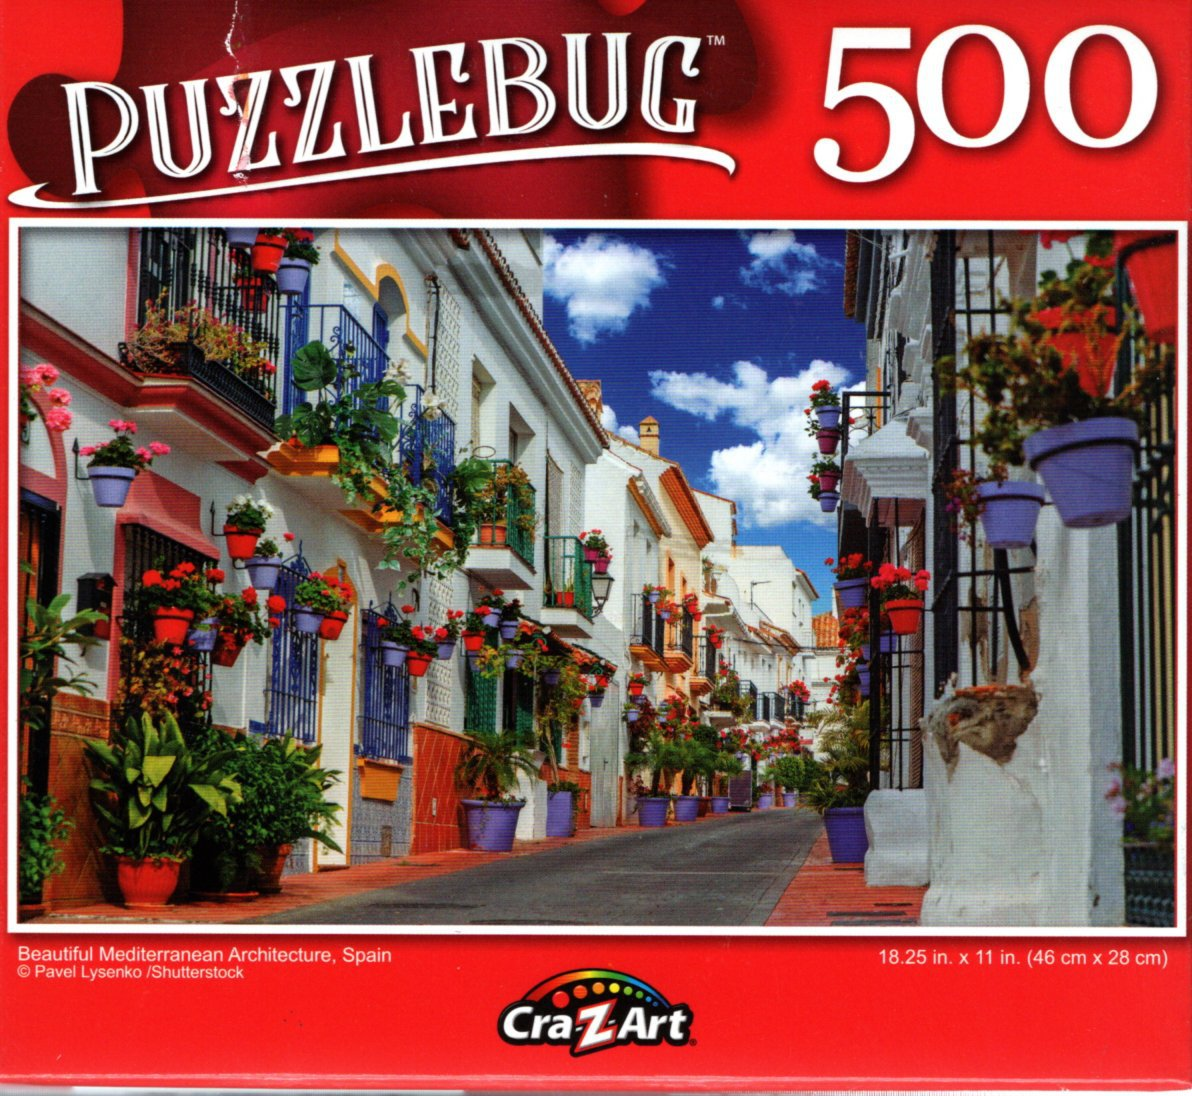 Beautiful Mediterranean Architecture, Spain - 500 Pieces Jigsaw Puzzle